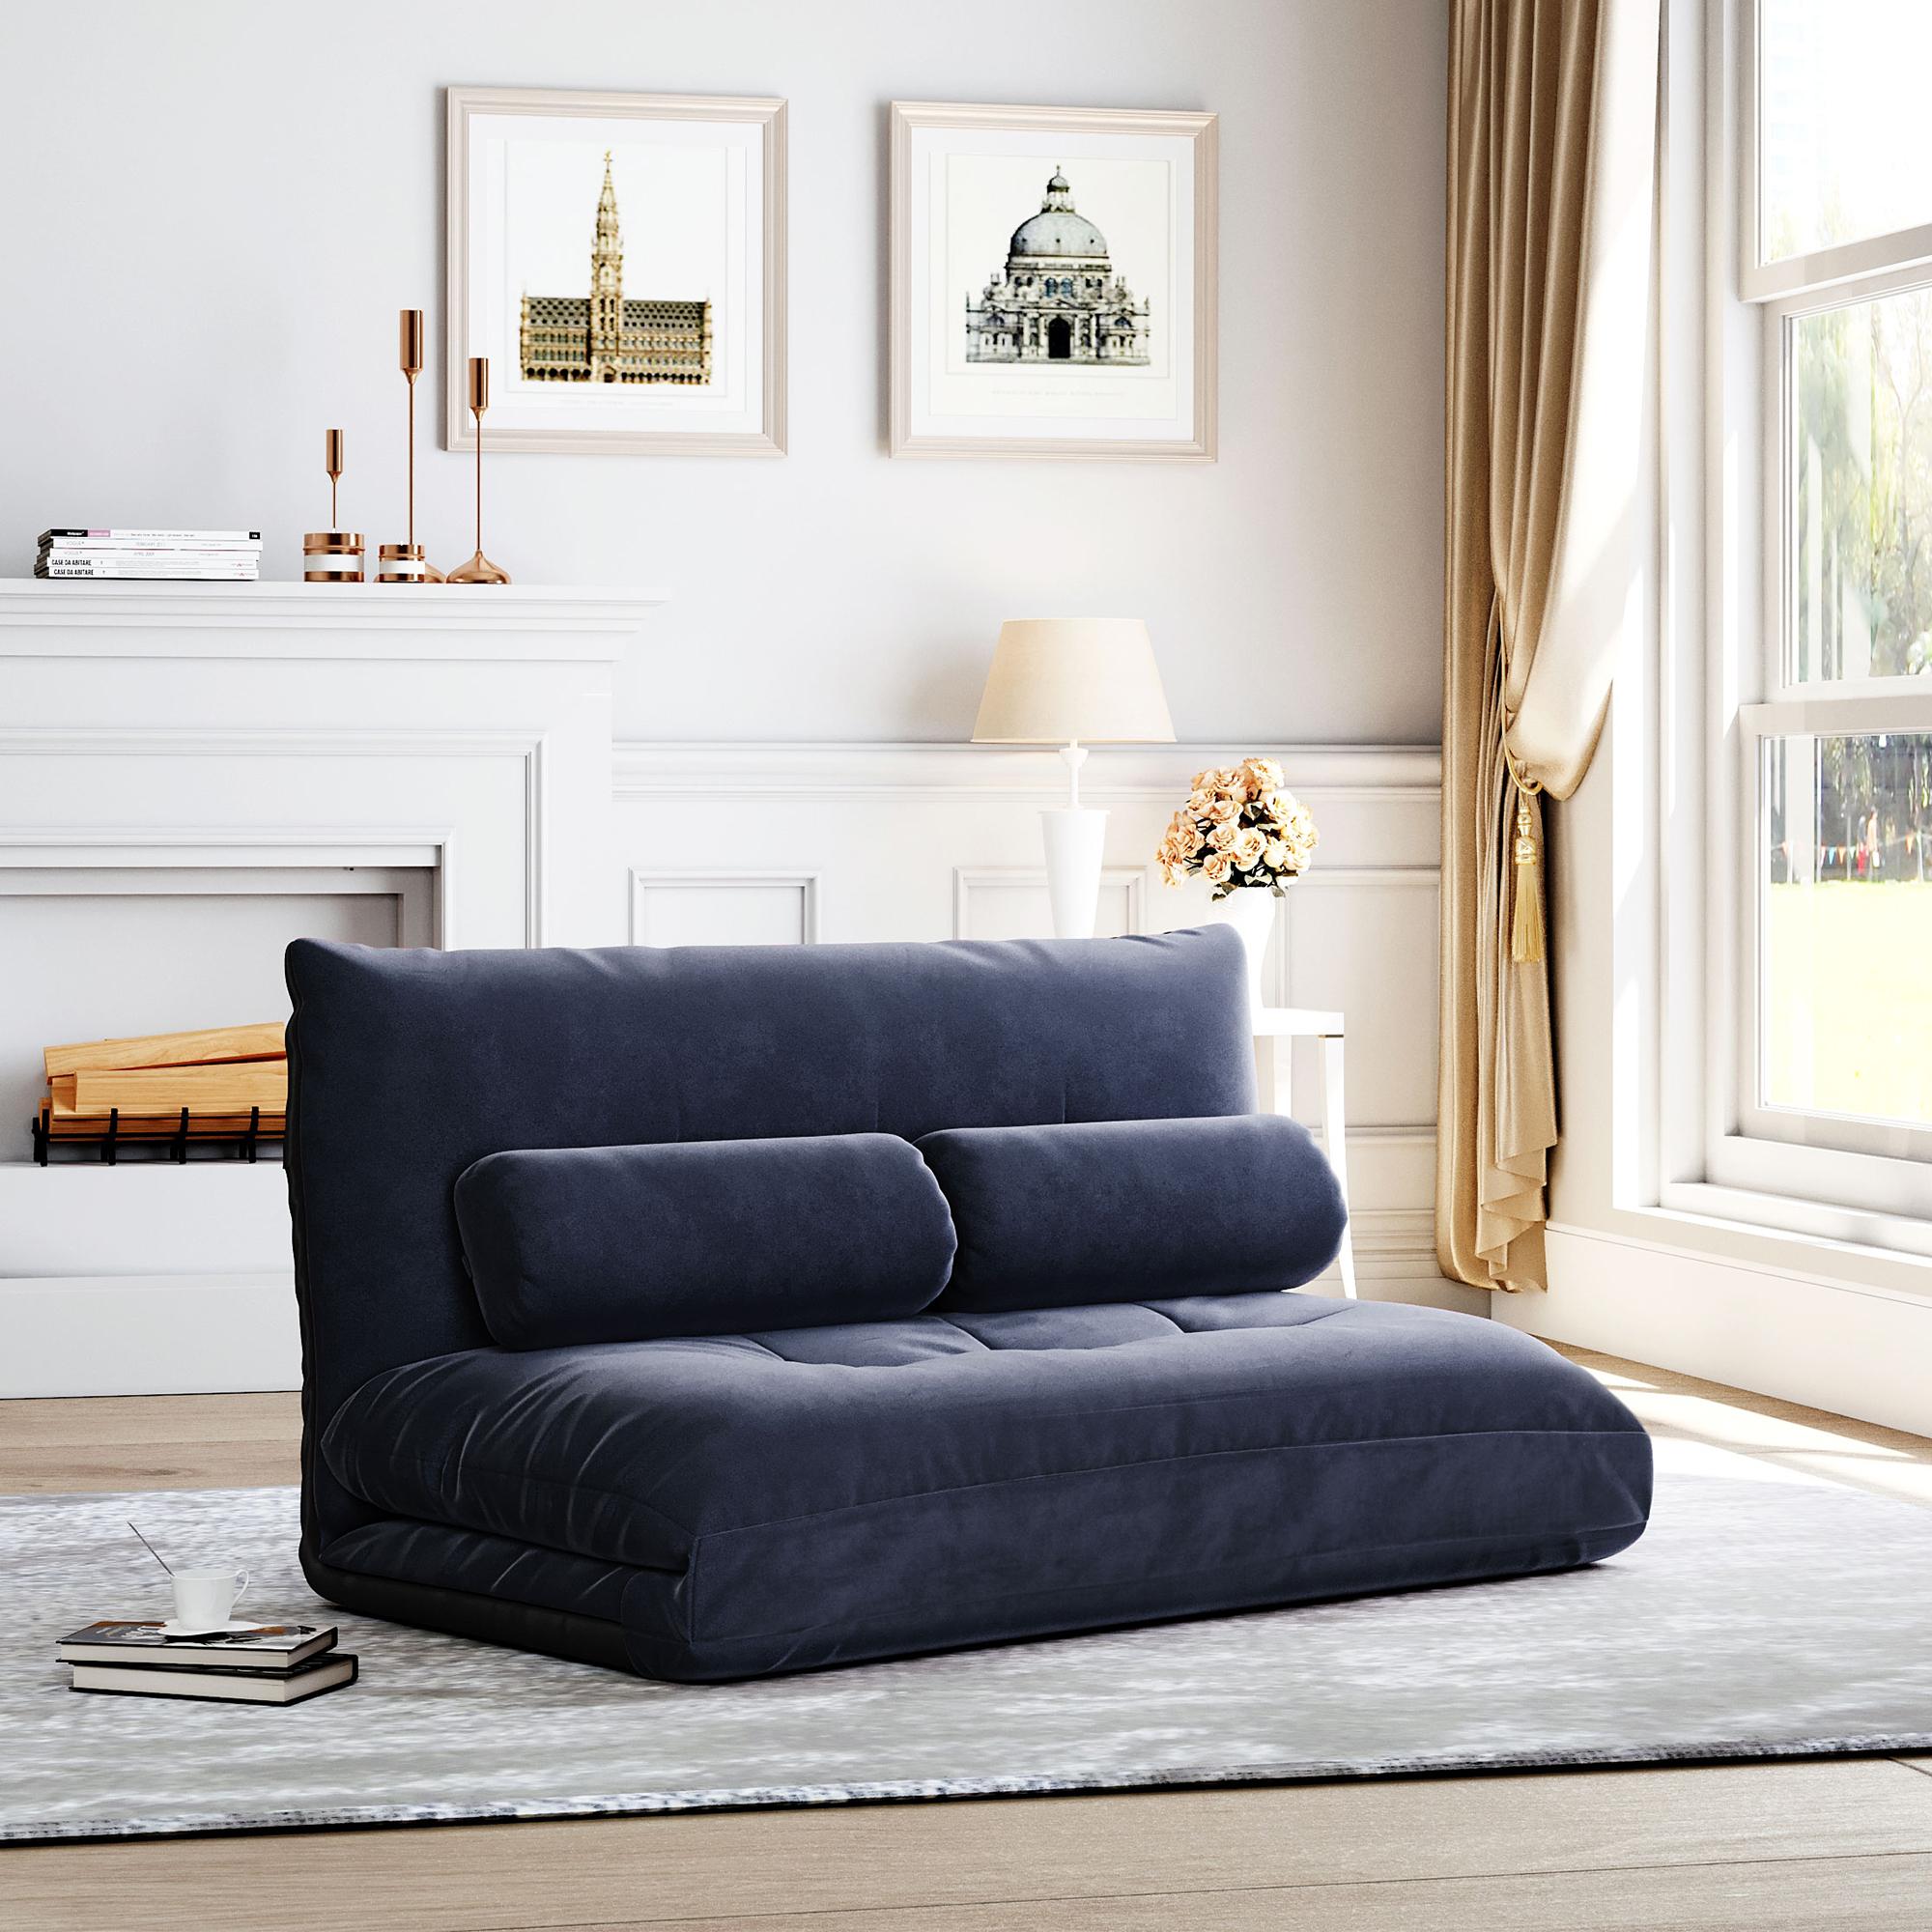 [US Direct] Orisfur. Sofa Bed Adjustable Folding Futon Sofa Video Gaming Sofa Lounge Sofa with Two Pillows